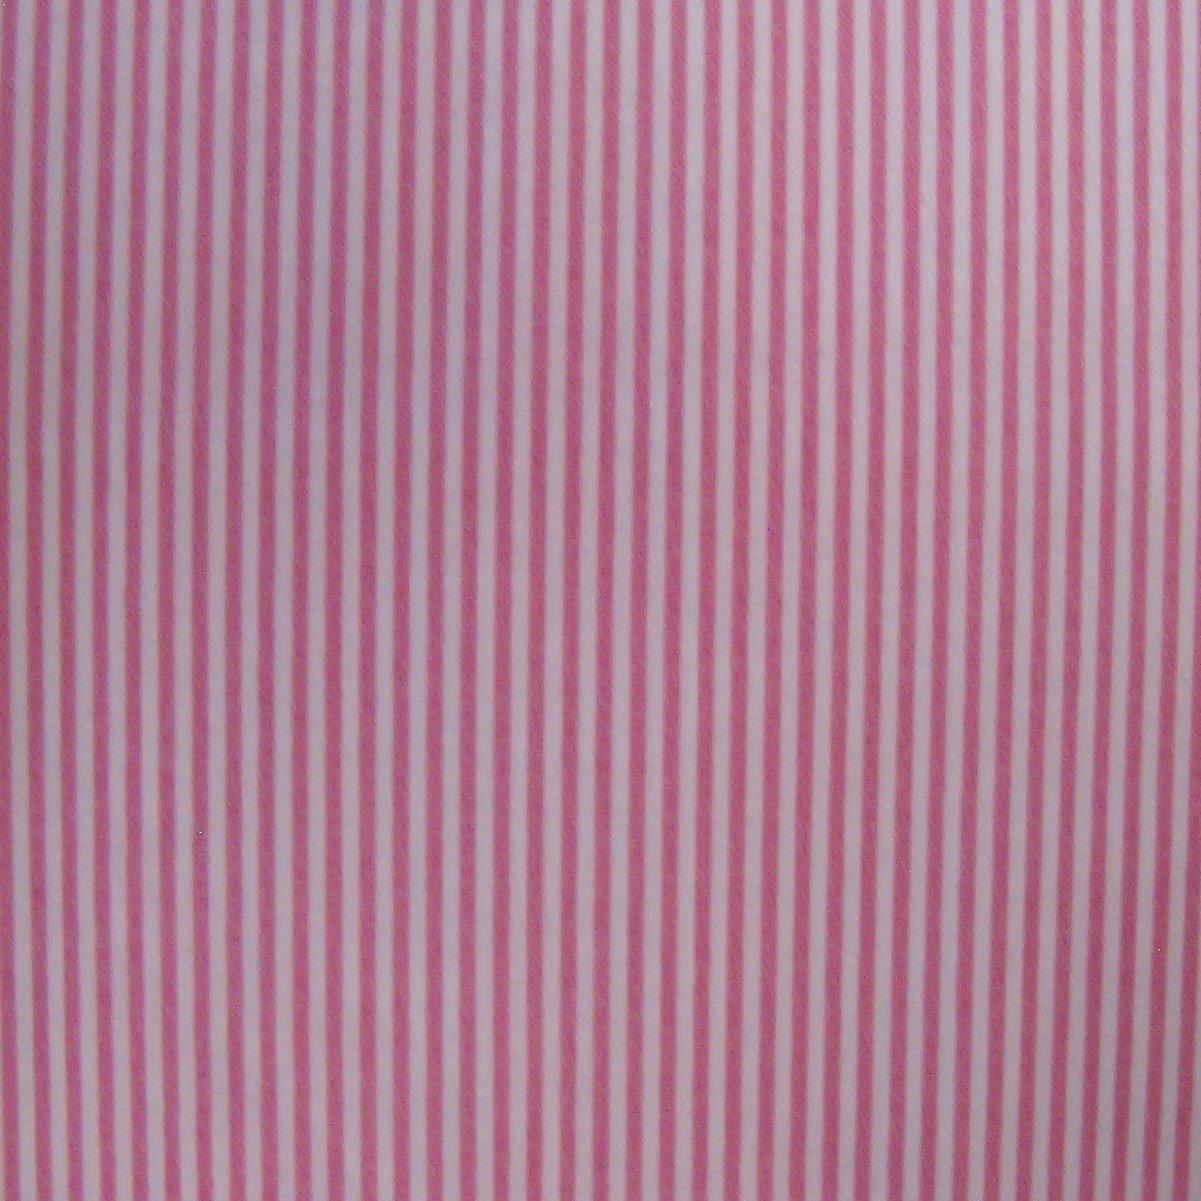 Bestie's Forever - Pink Stripe